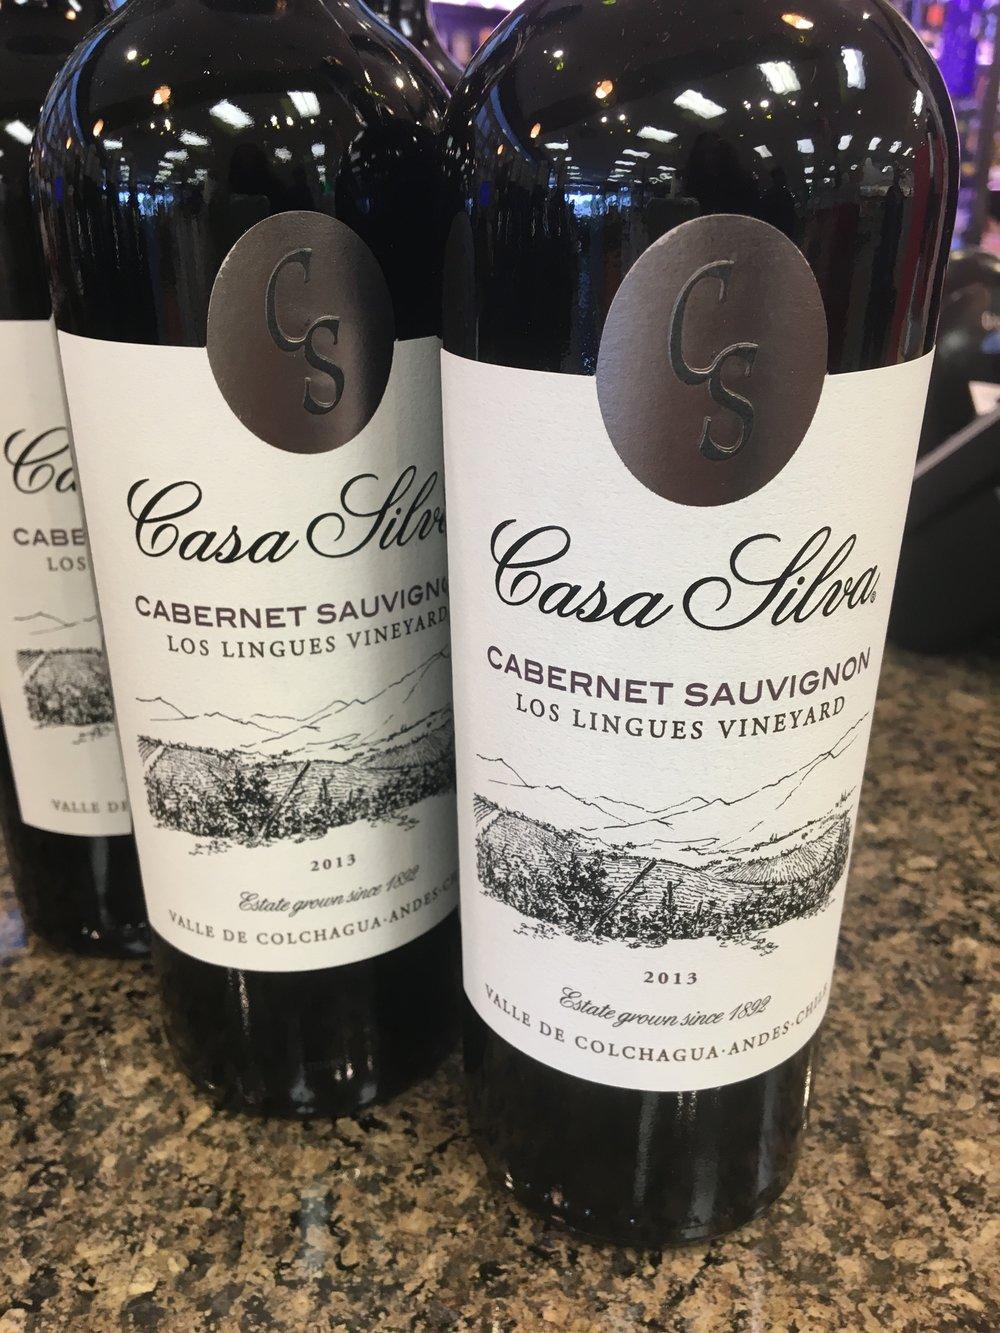 Casa Silva wine.jpg